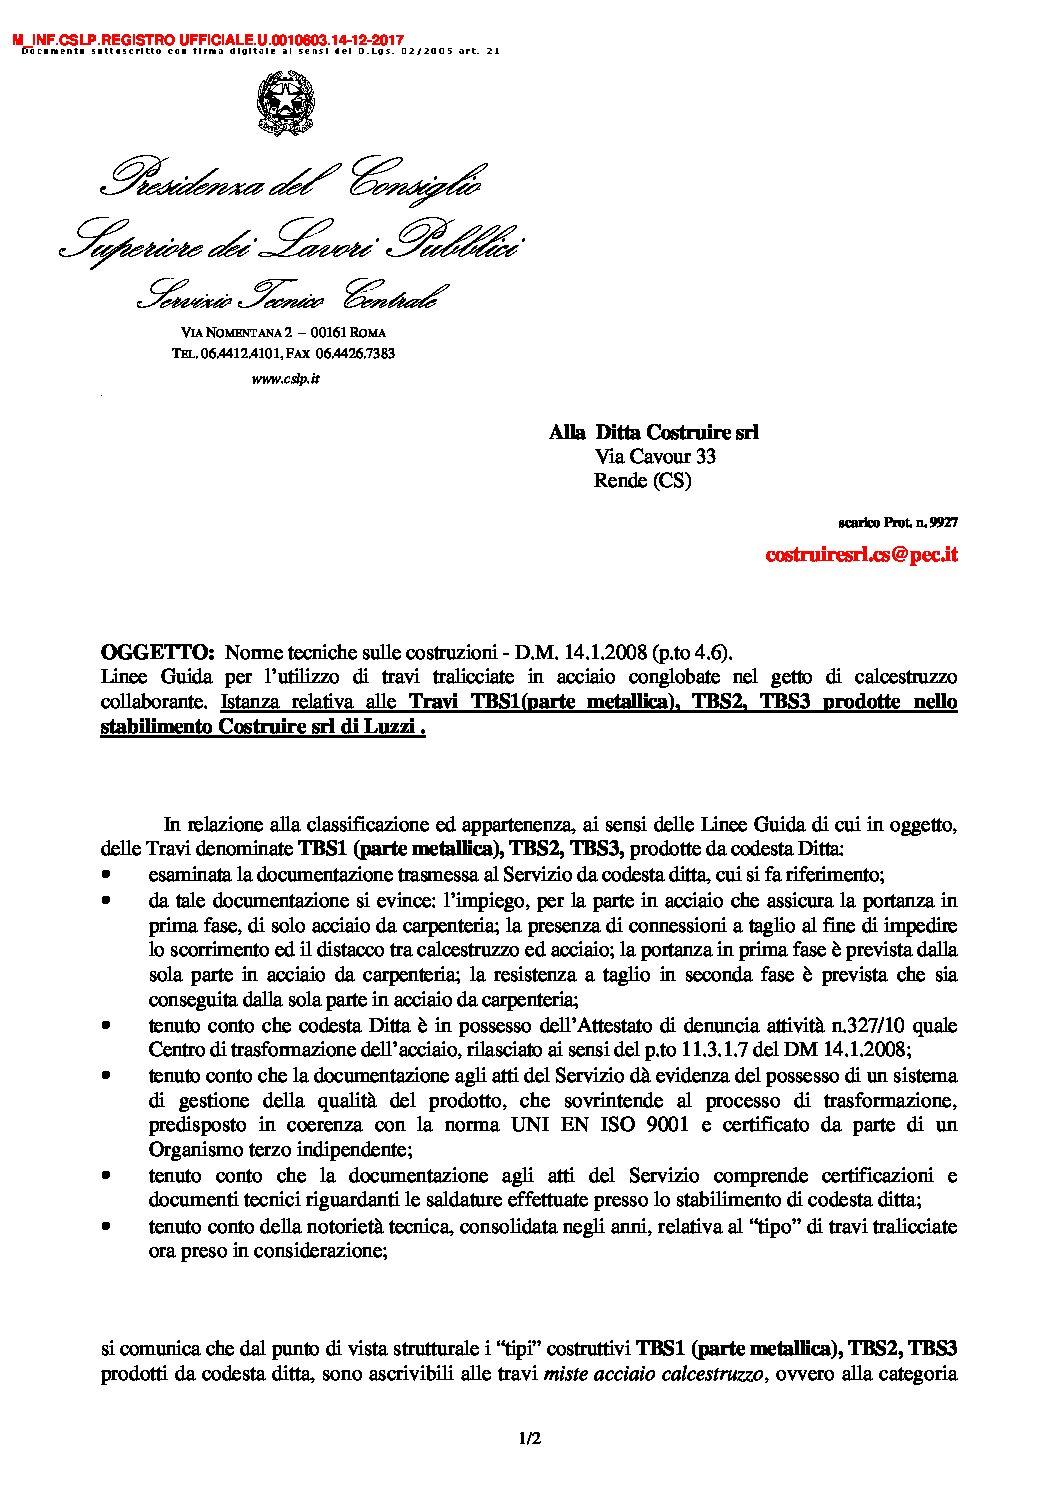 CSLP REGISTRO UFFICIALE 2017 0010603 pdf